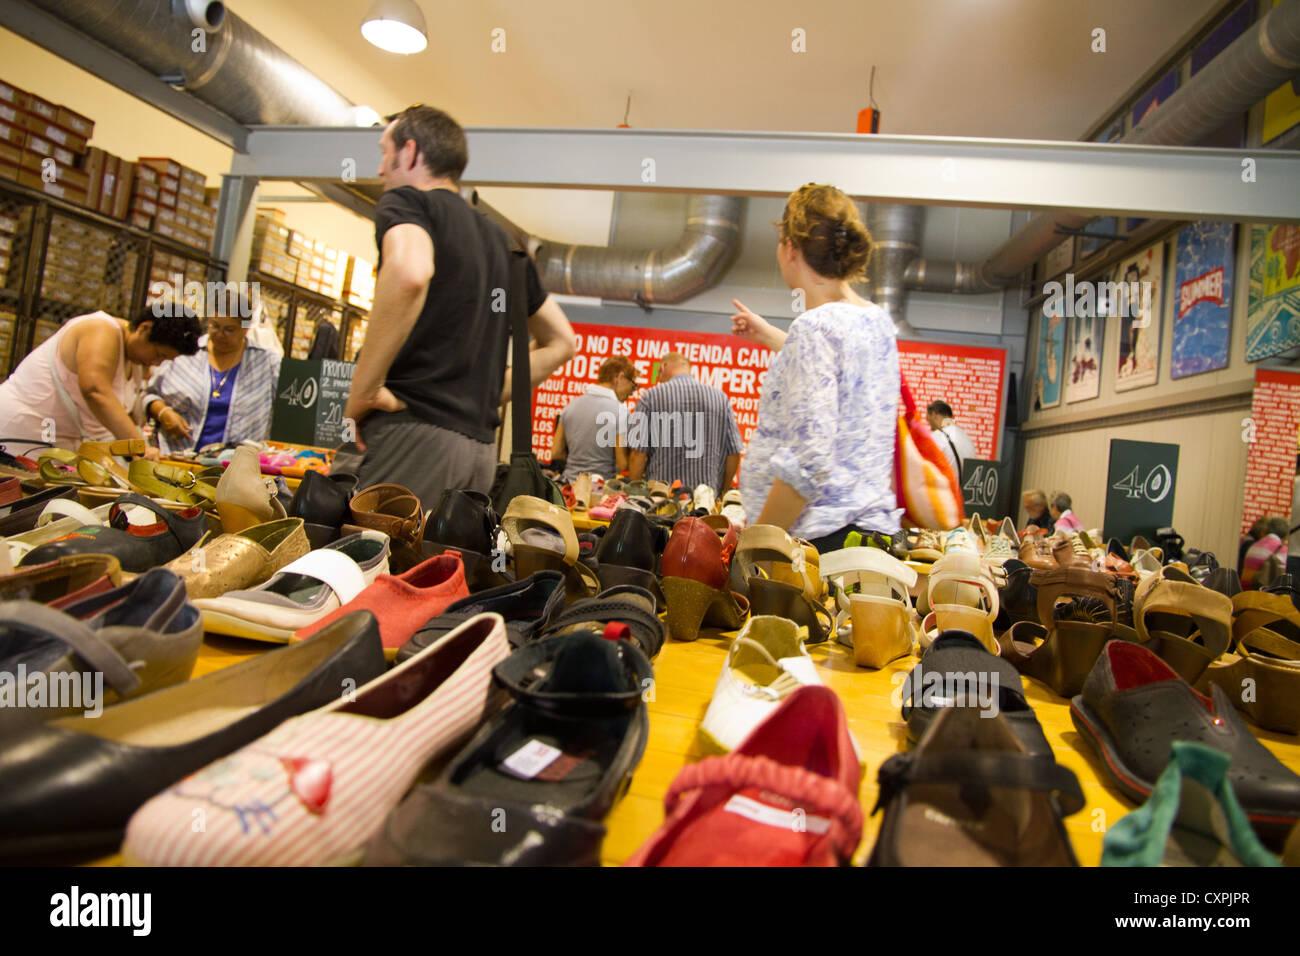 Scarpe store shop uscita Camper, Inca Mallorca Spagna Spain